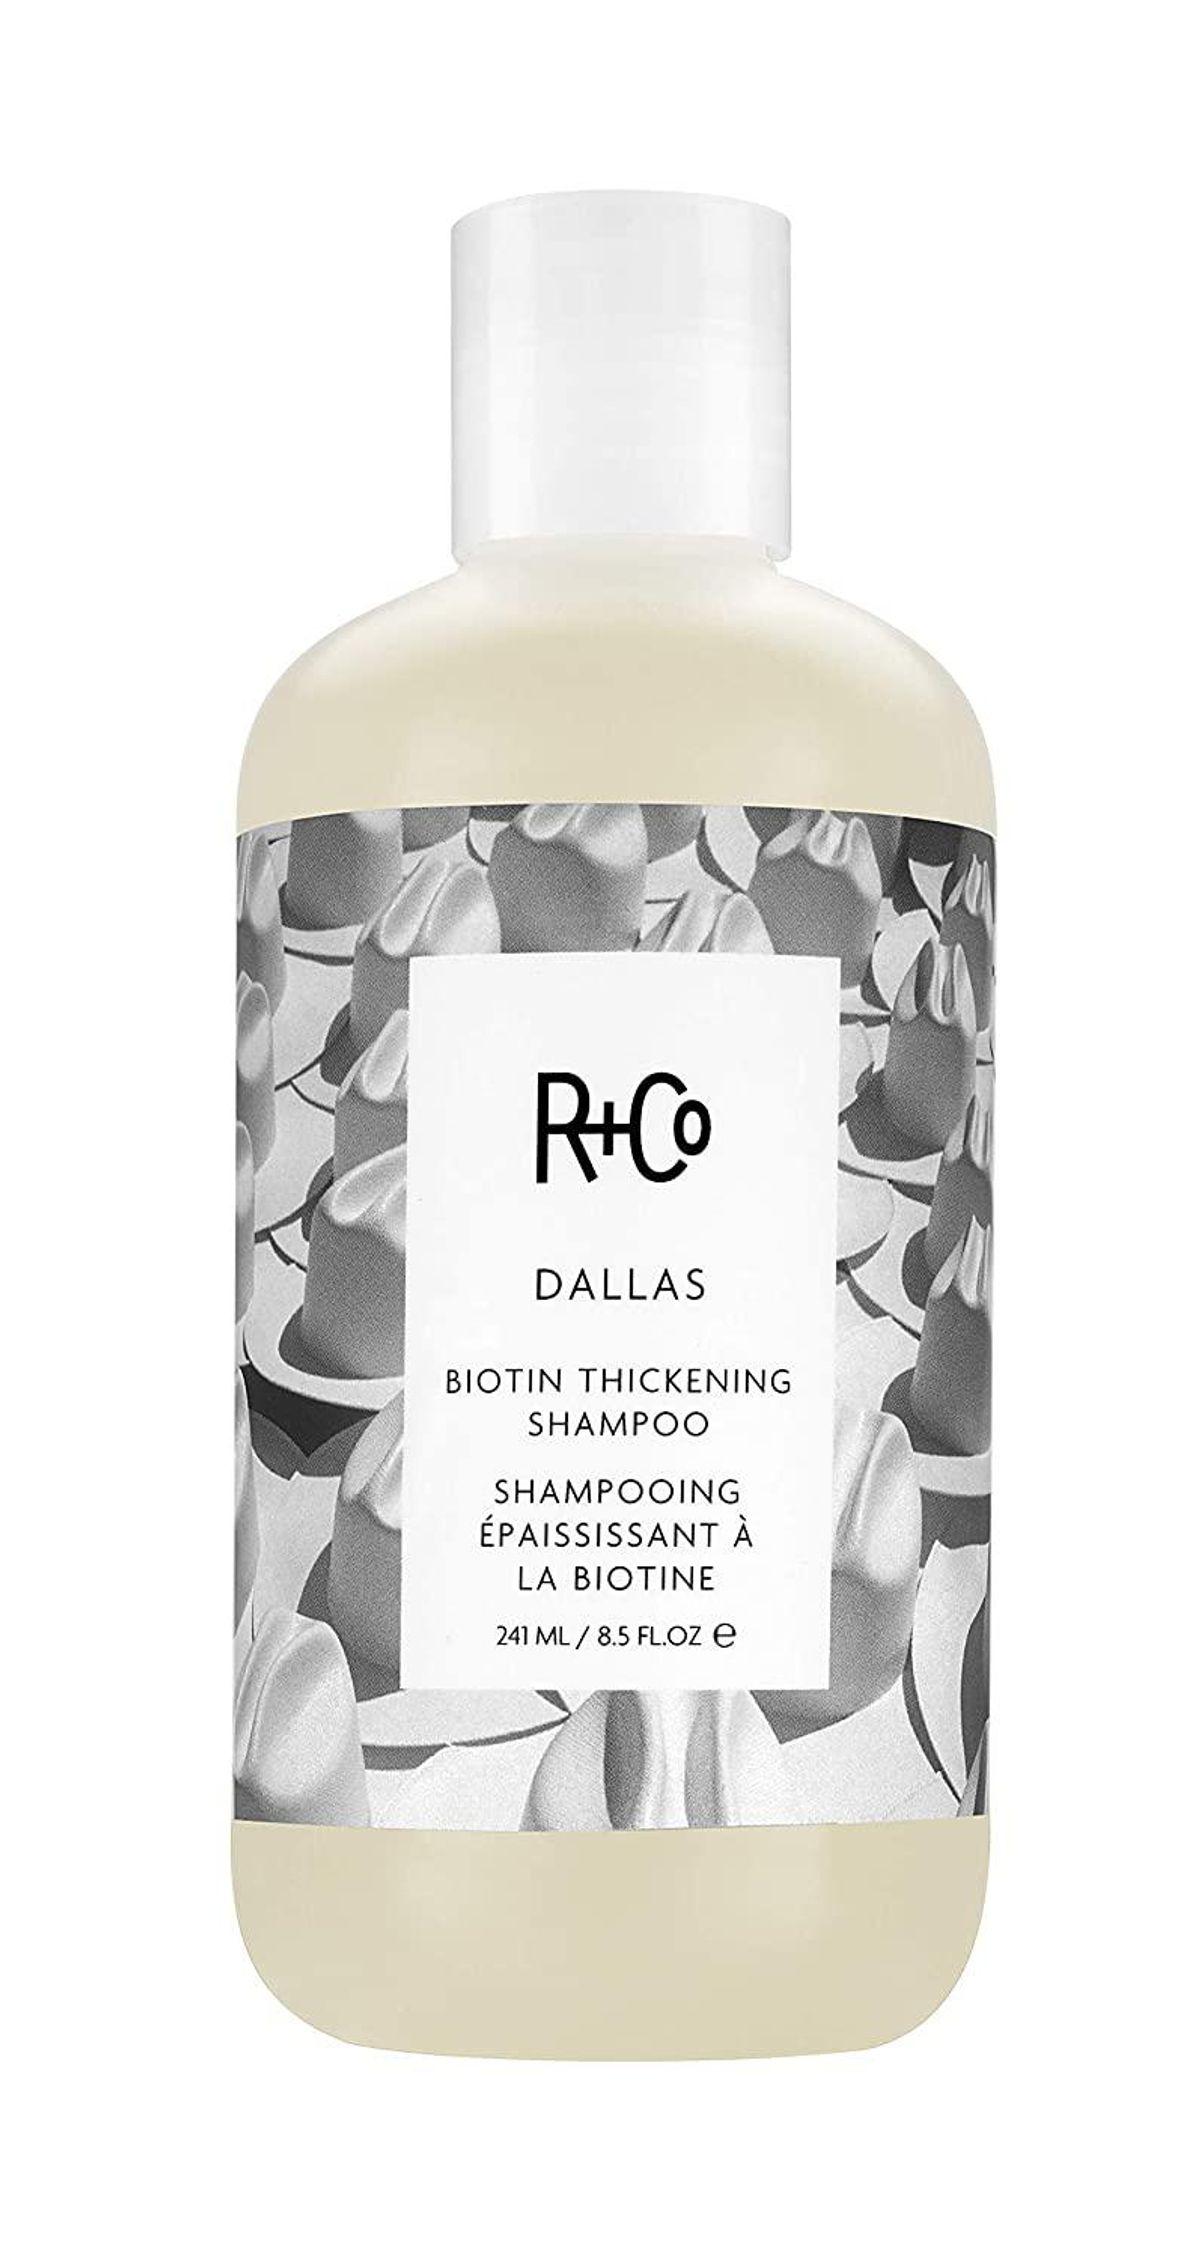 r and co dallas biotin thickening shampoo